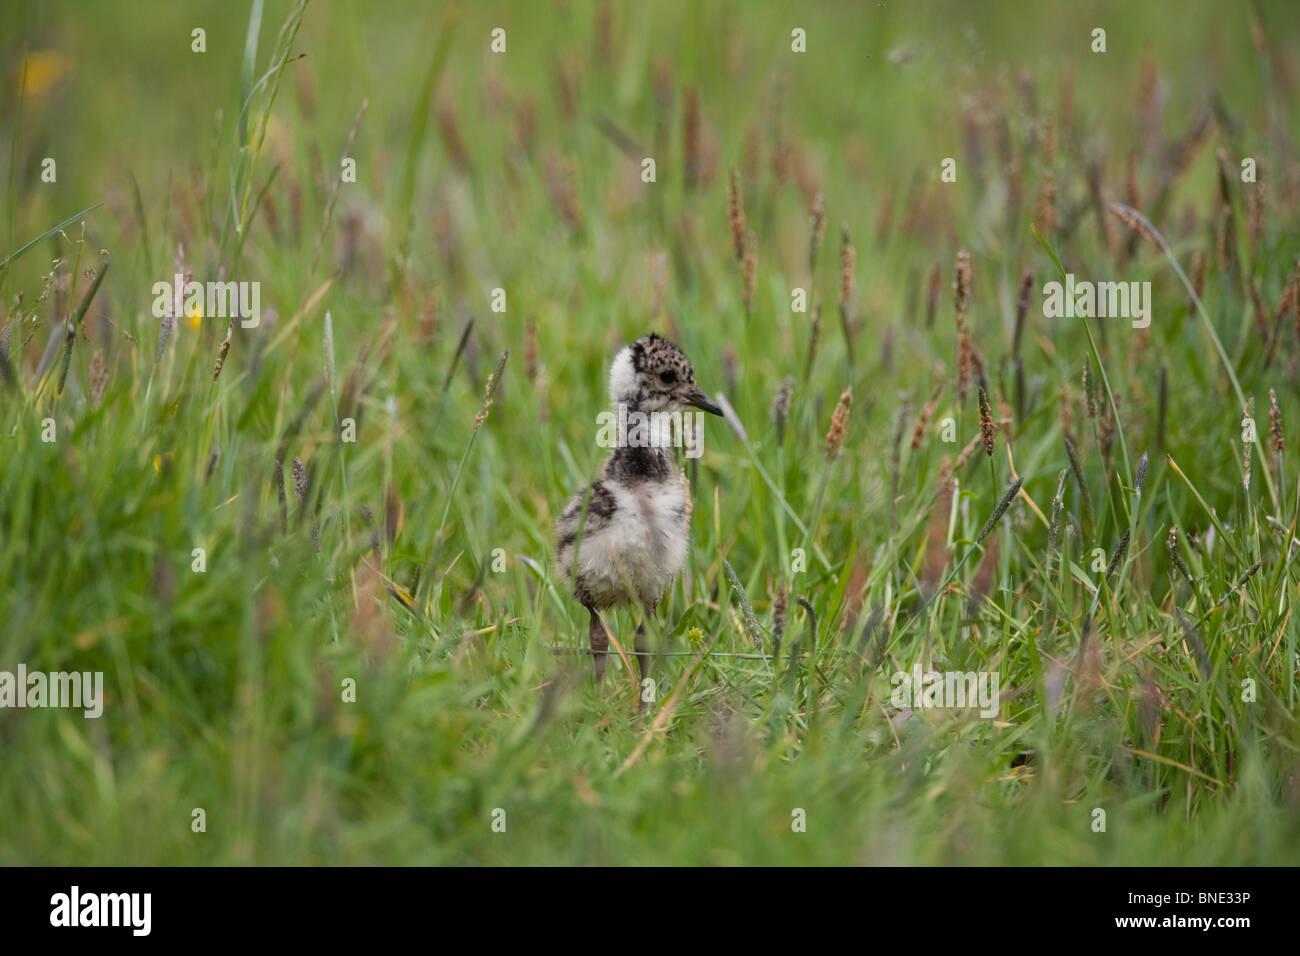 Lapwing chick. - Stock Image